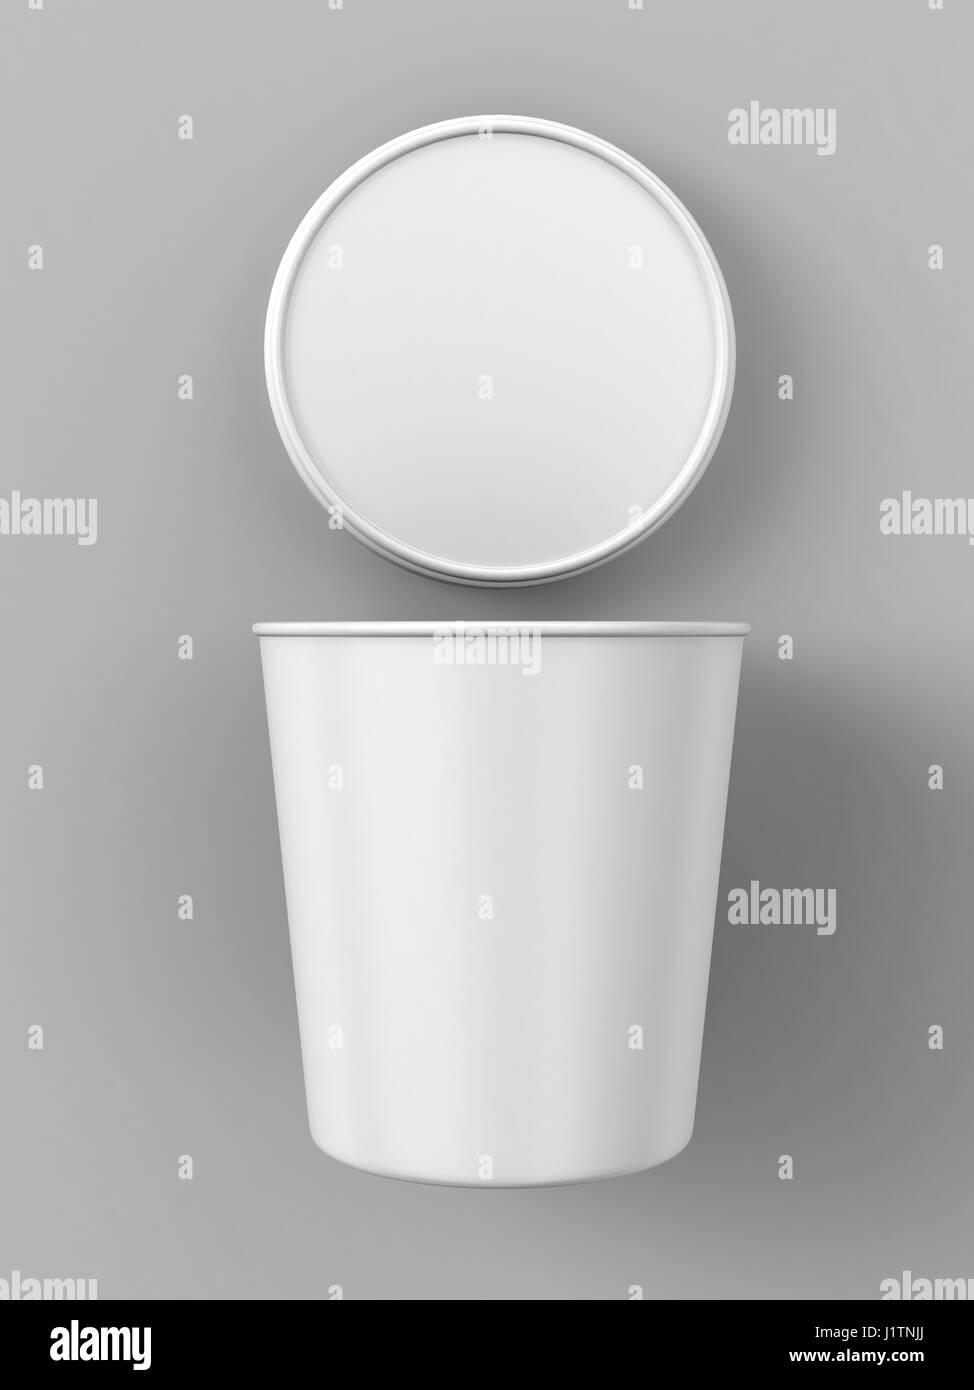 Ice Cream Black and White Stock Photos & Images - Alamy